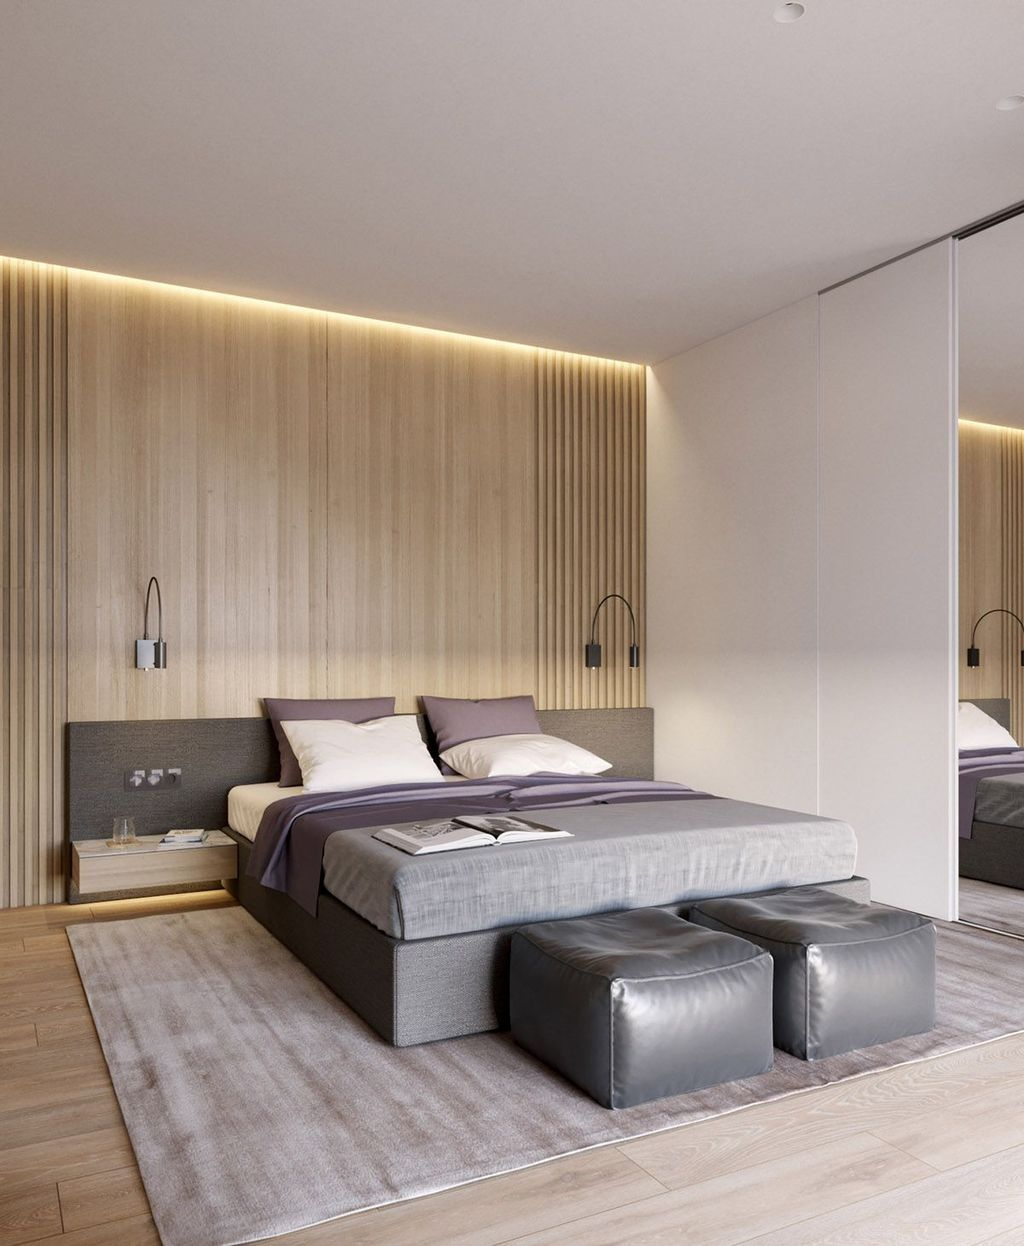 inspiring bedroom designs ideas decora iuni dormitor dormitoare design modern cas case moderne also dan rh ro pinterest